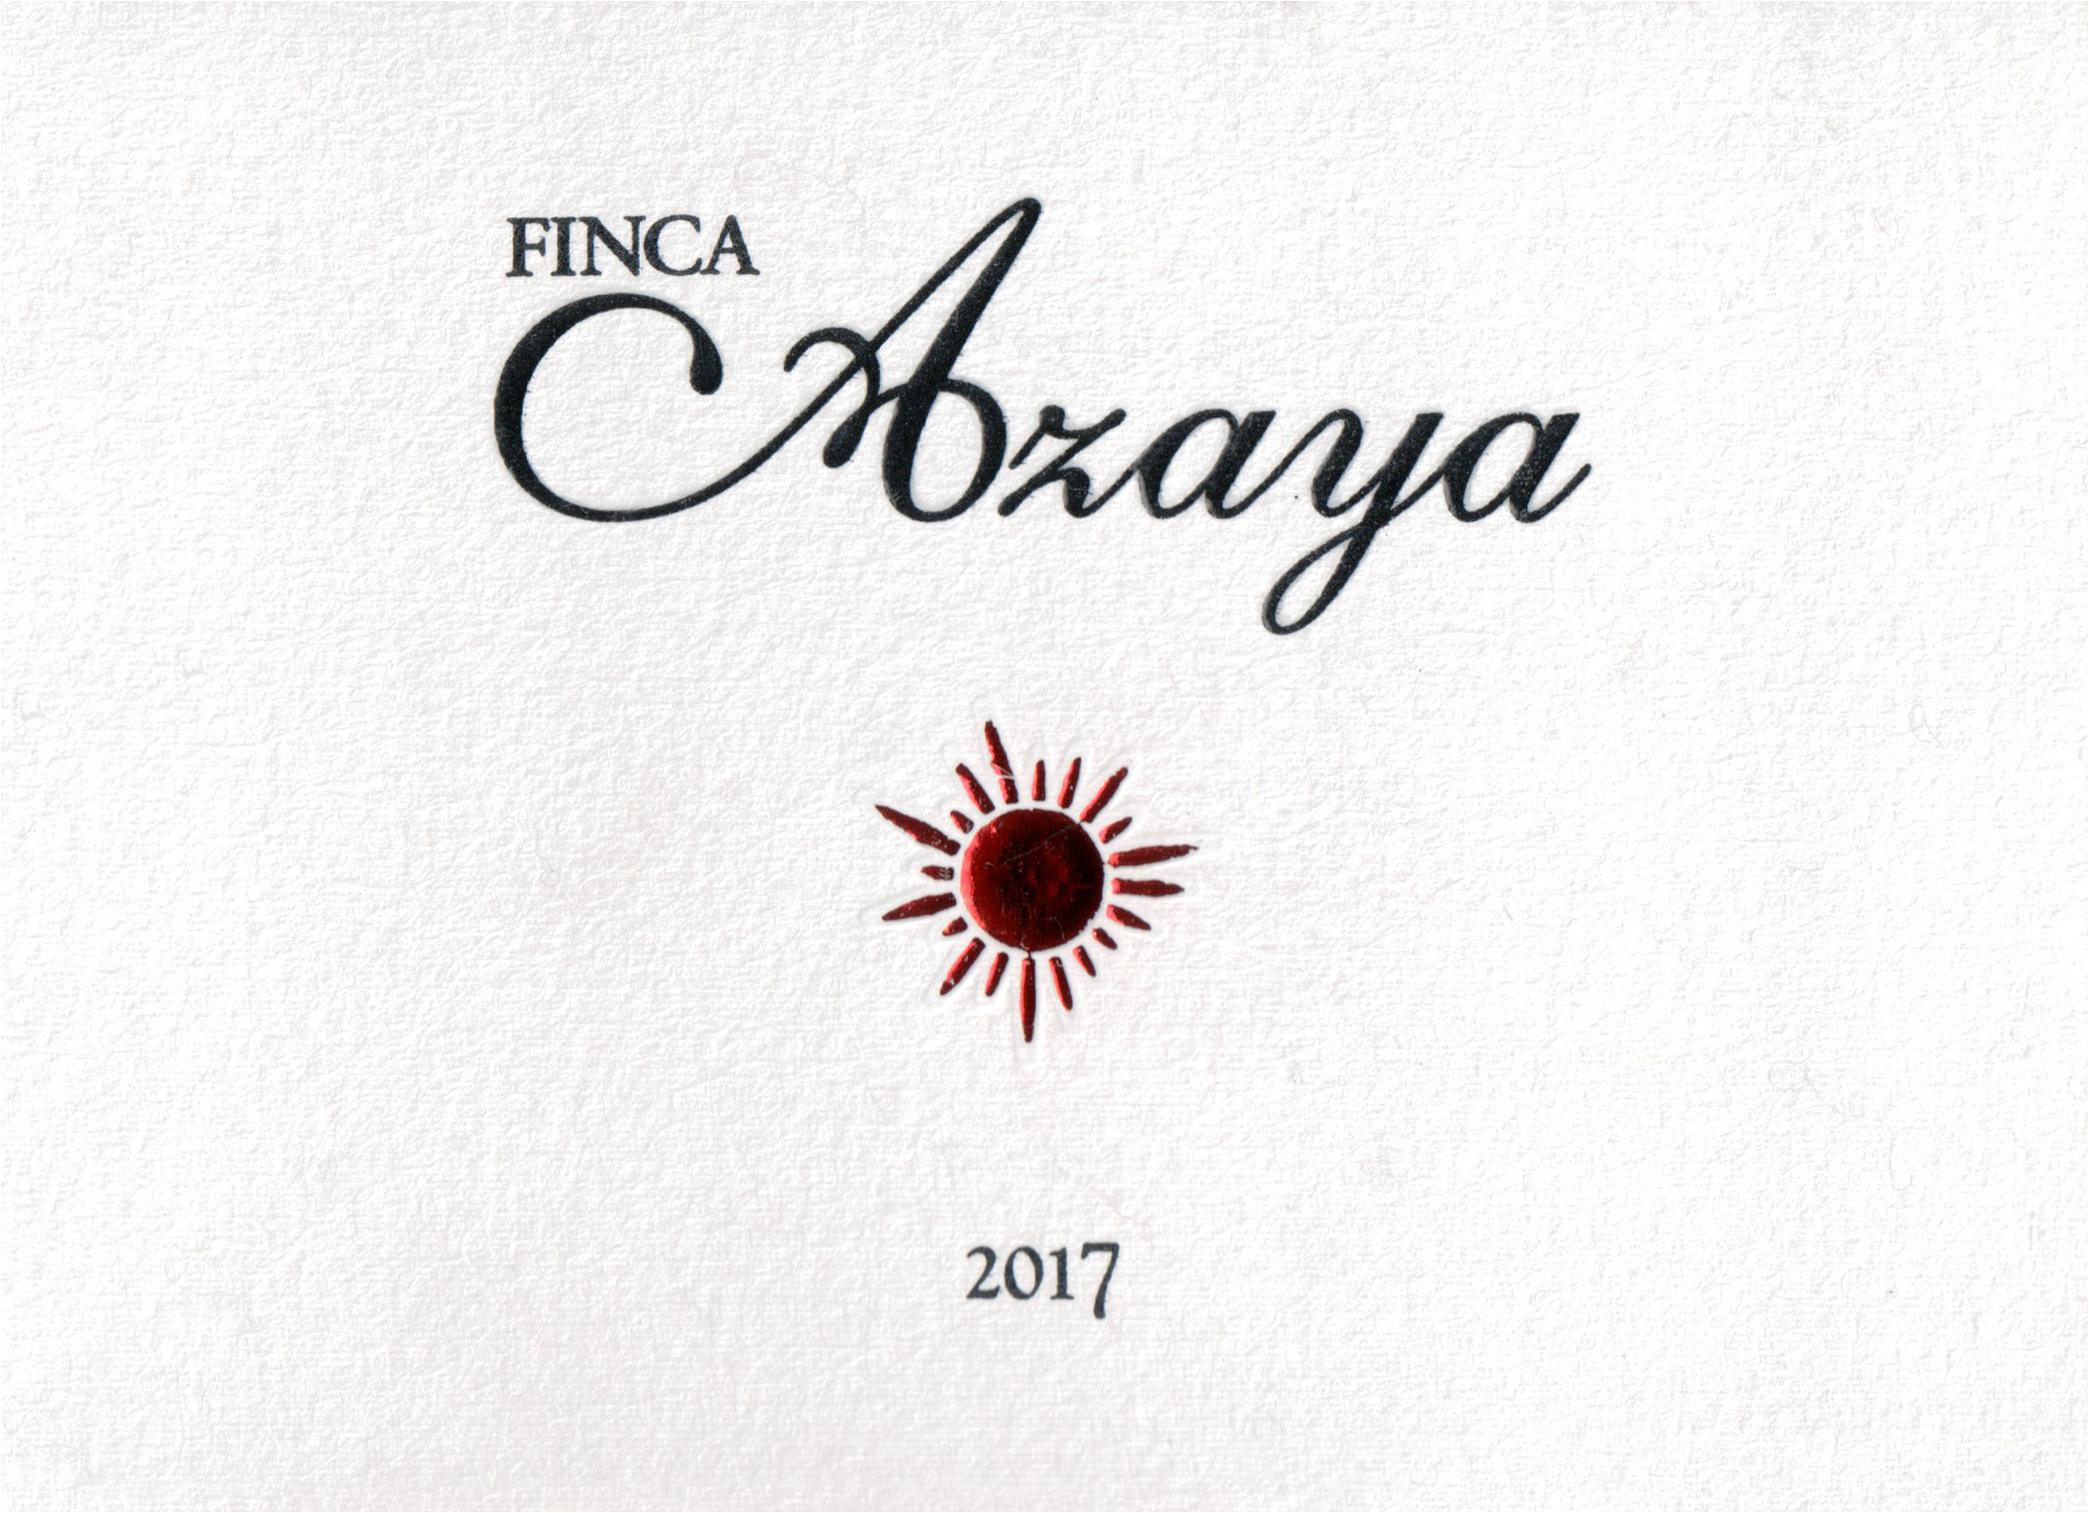 Valduero Finca Azaya 2017